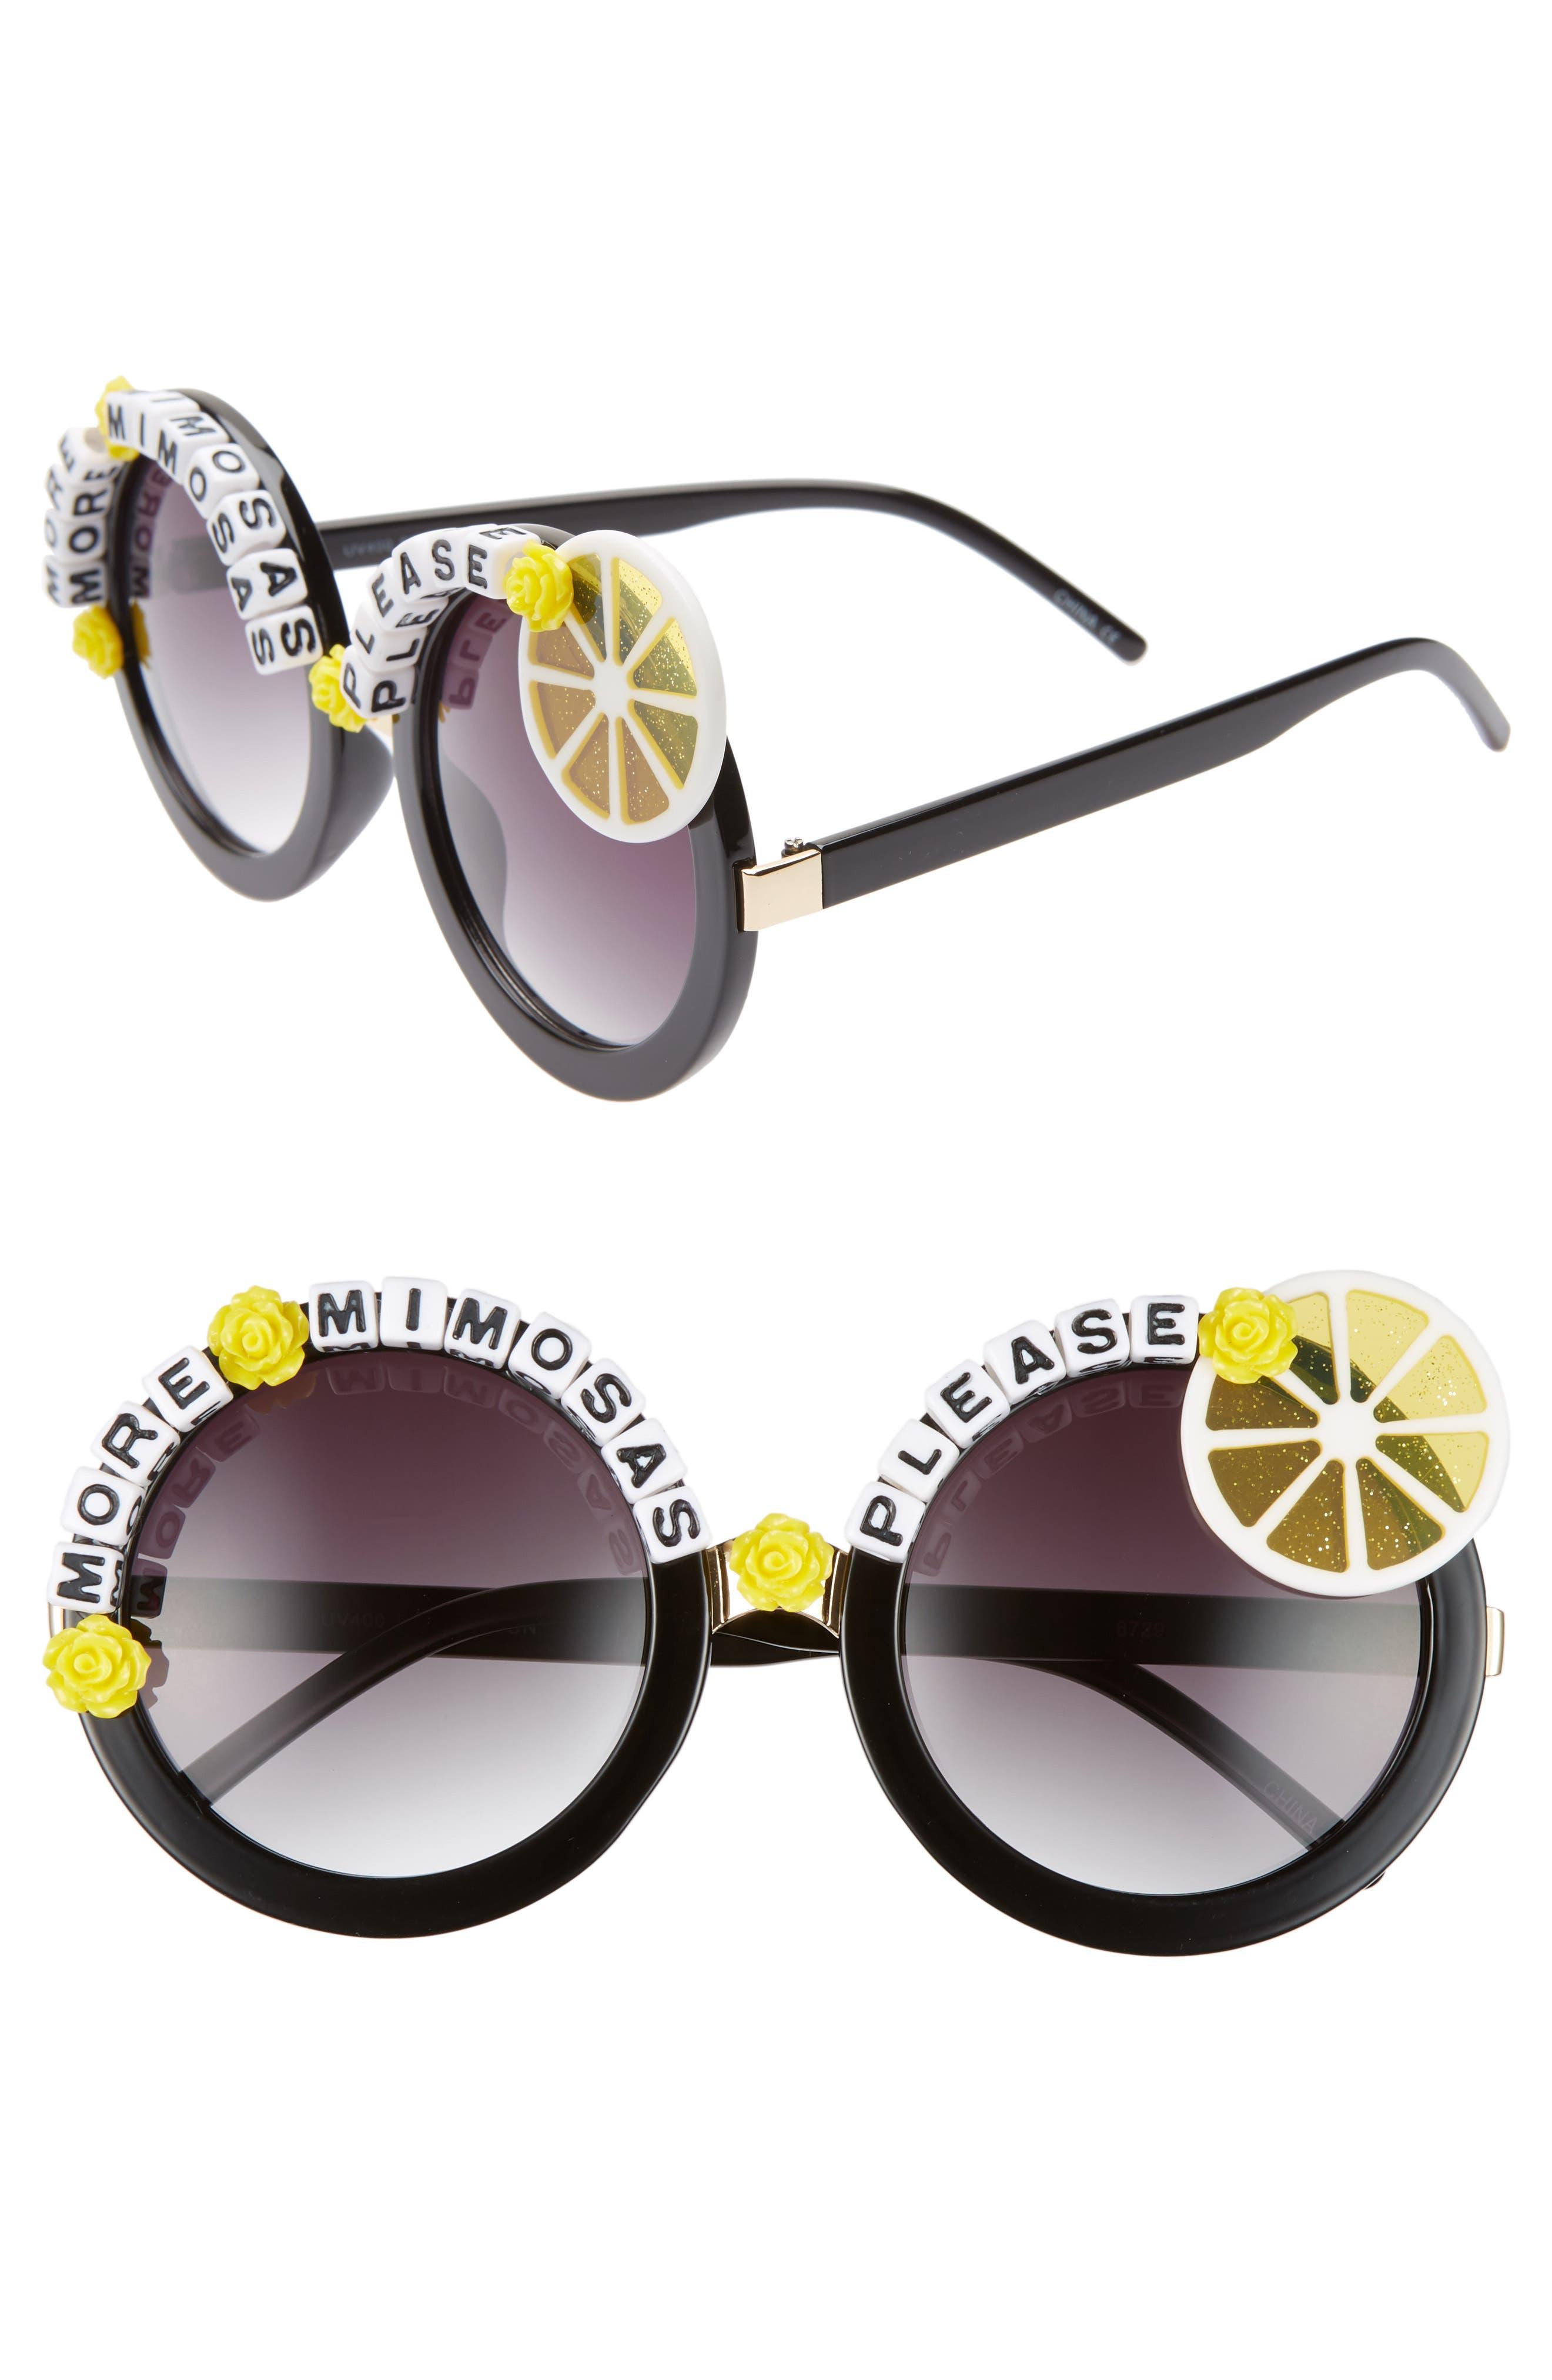 Rad + Refined More Mimosas Sunglasses - Black/ Yellow